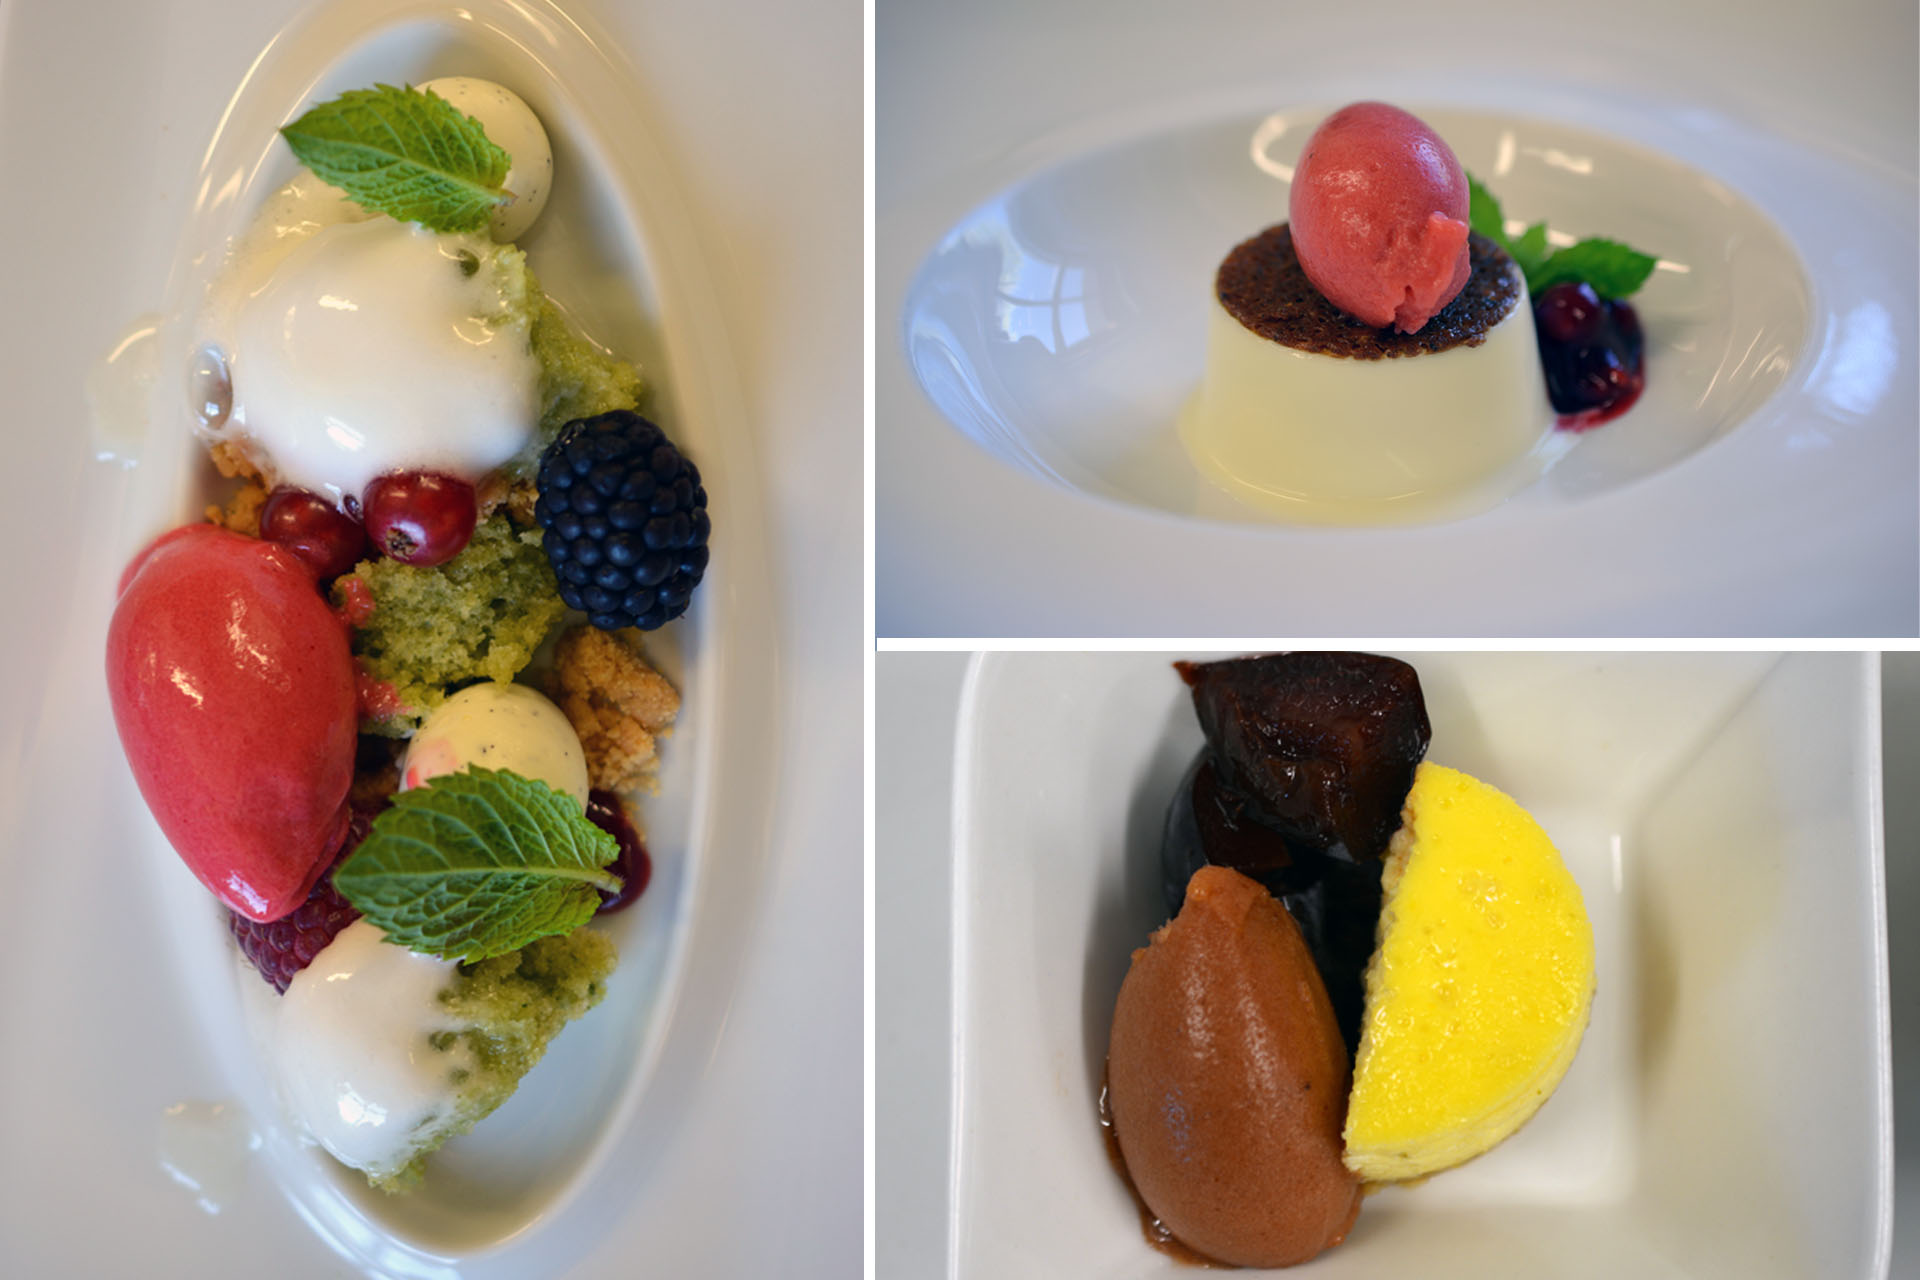 Sommergarten, Panna Cotta mit Erbeer-Sorbet, Cheese-Cake mit Zwetschkensorbet